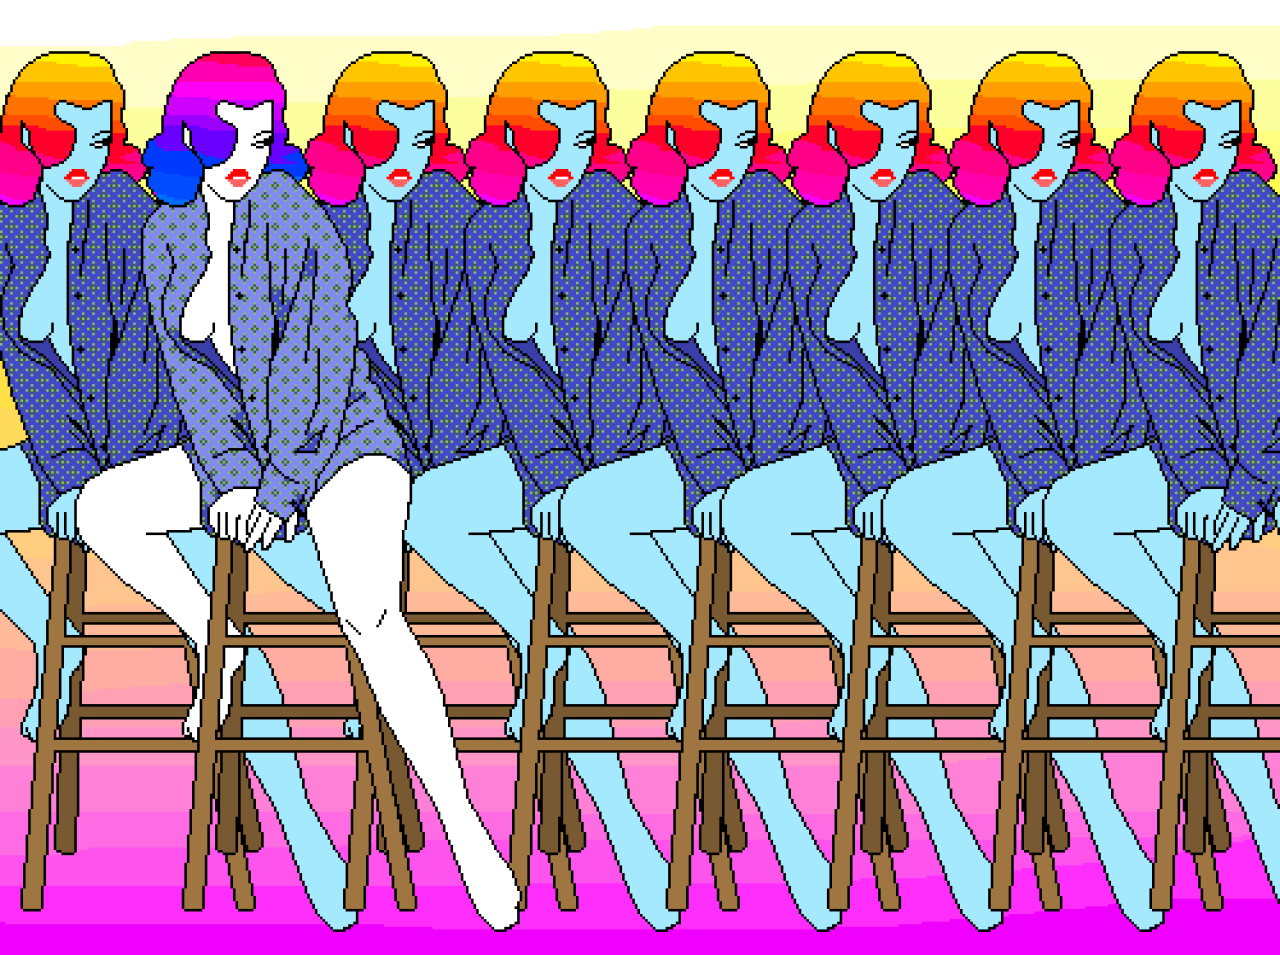 This gif has everything glitch pixel art graphic design vaporwave - Vaporwave Pixel Art By Quentin Laporte